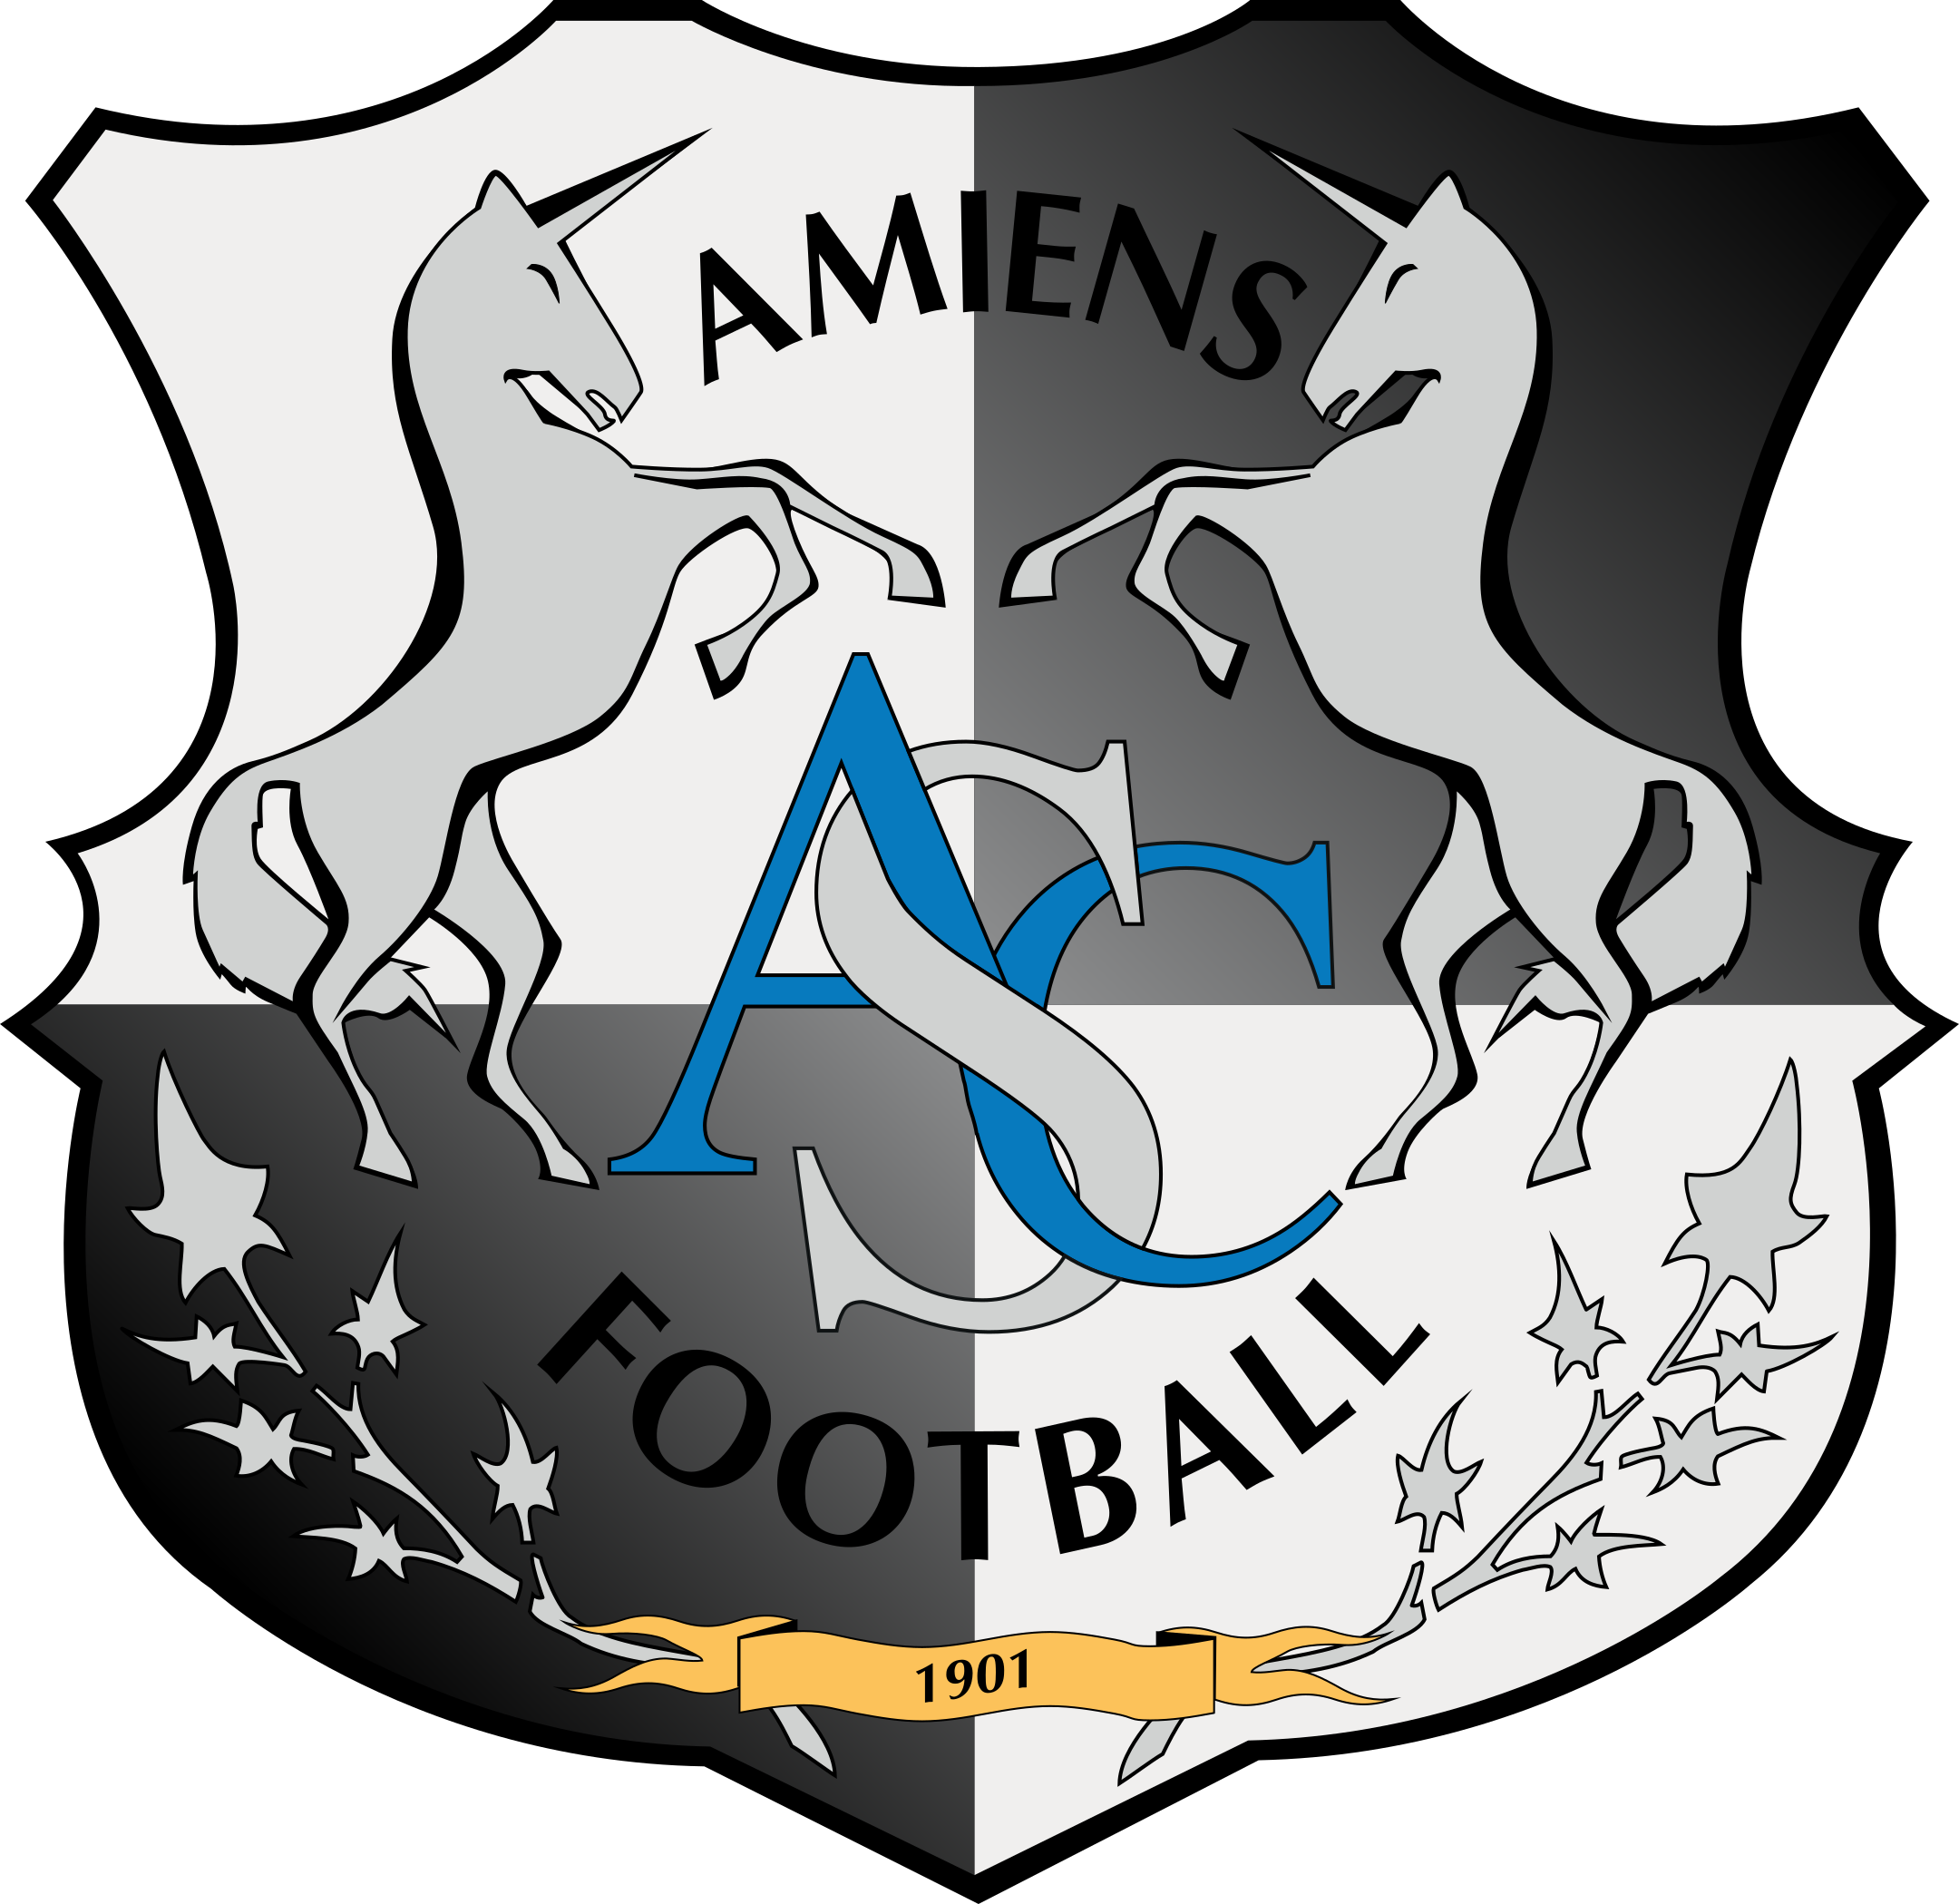 amiens sfc logo 1 - Amiens SCF Logo